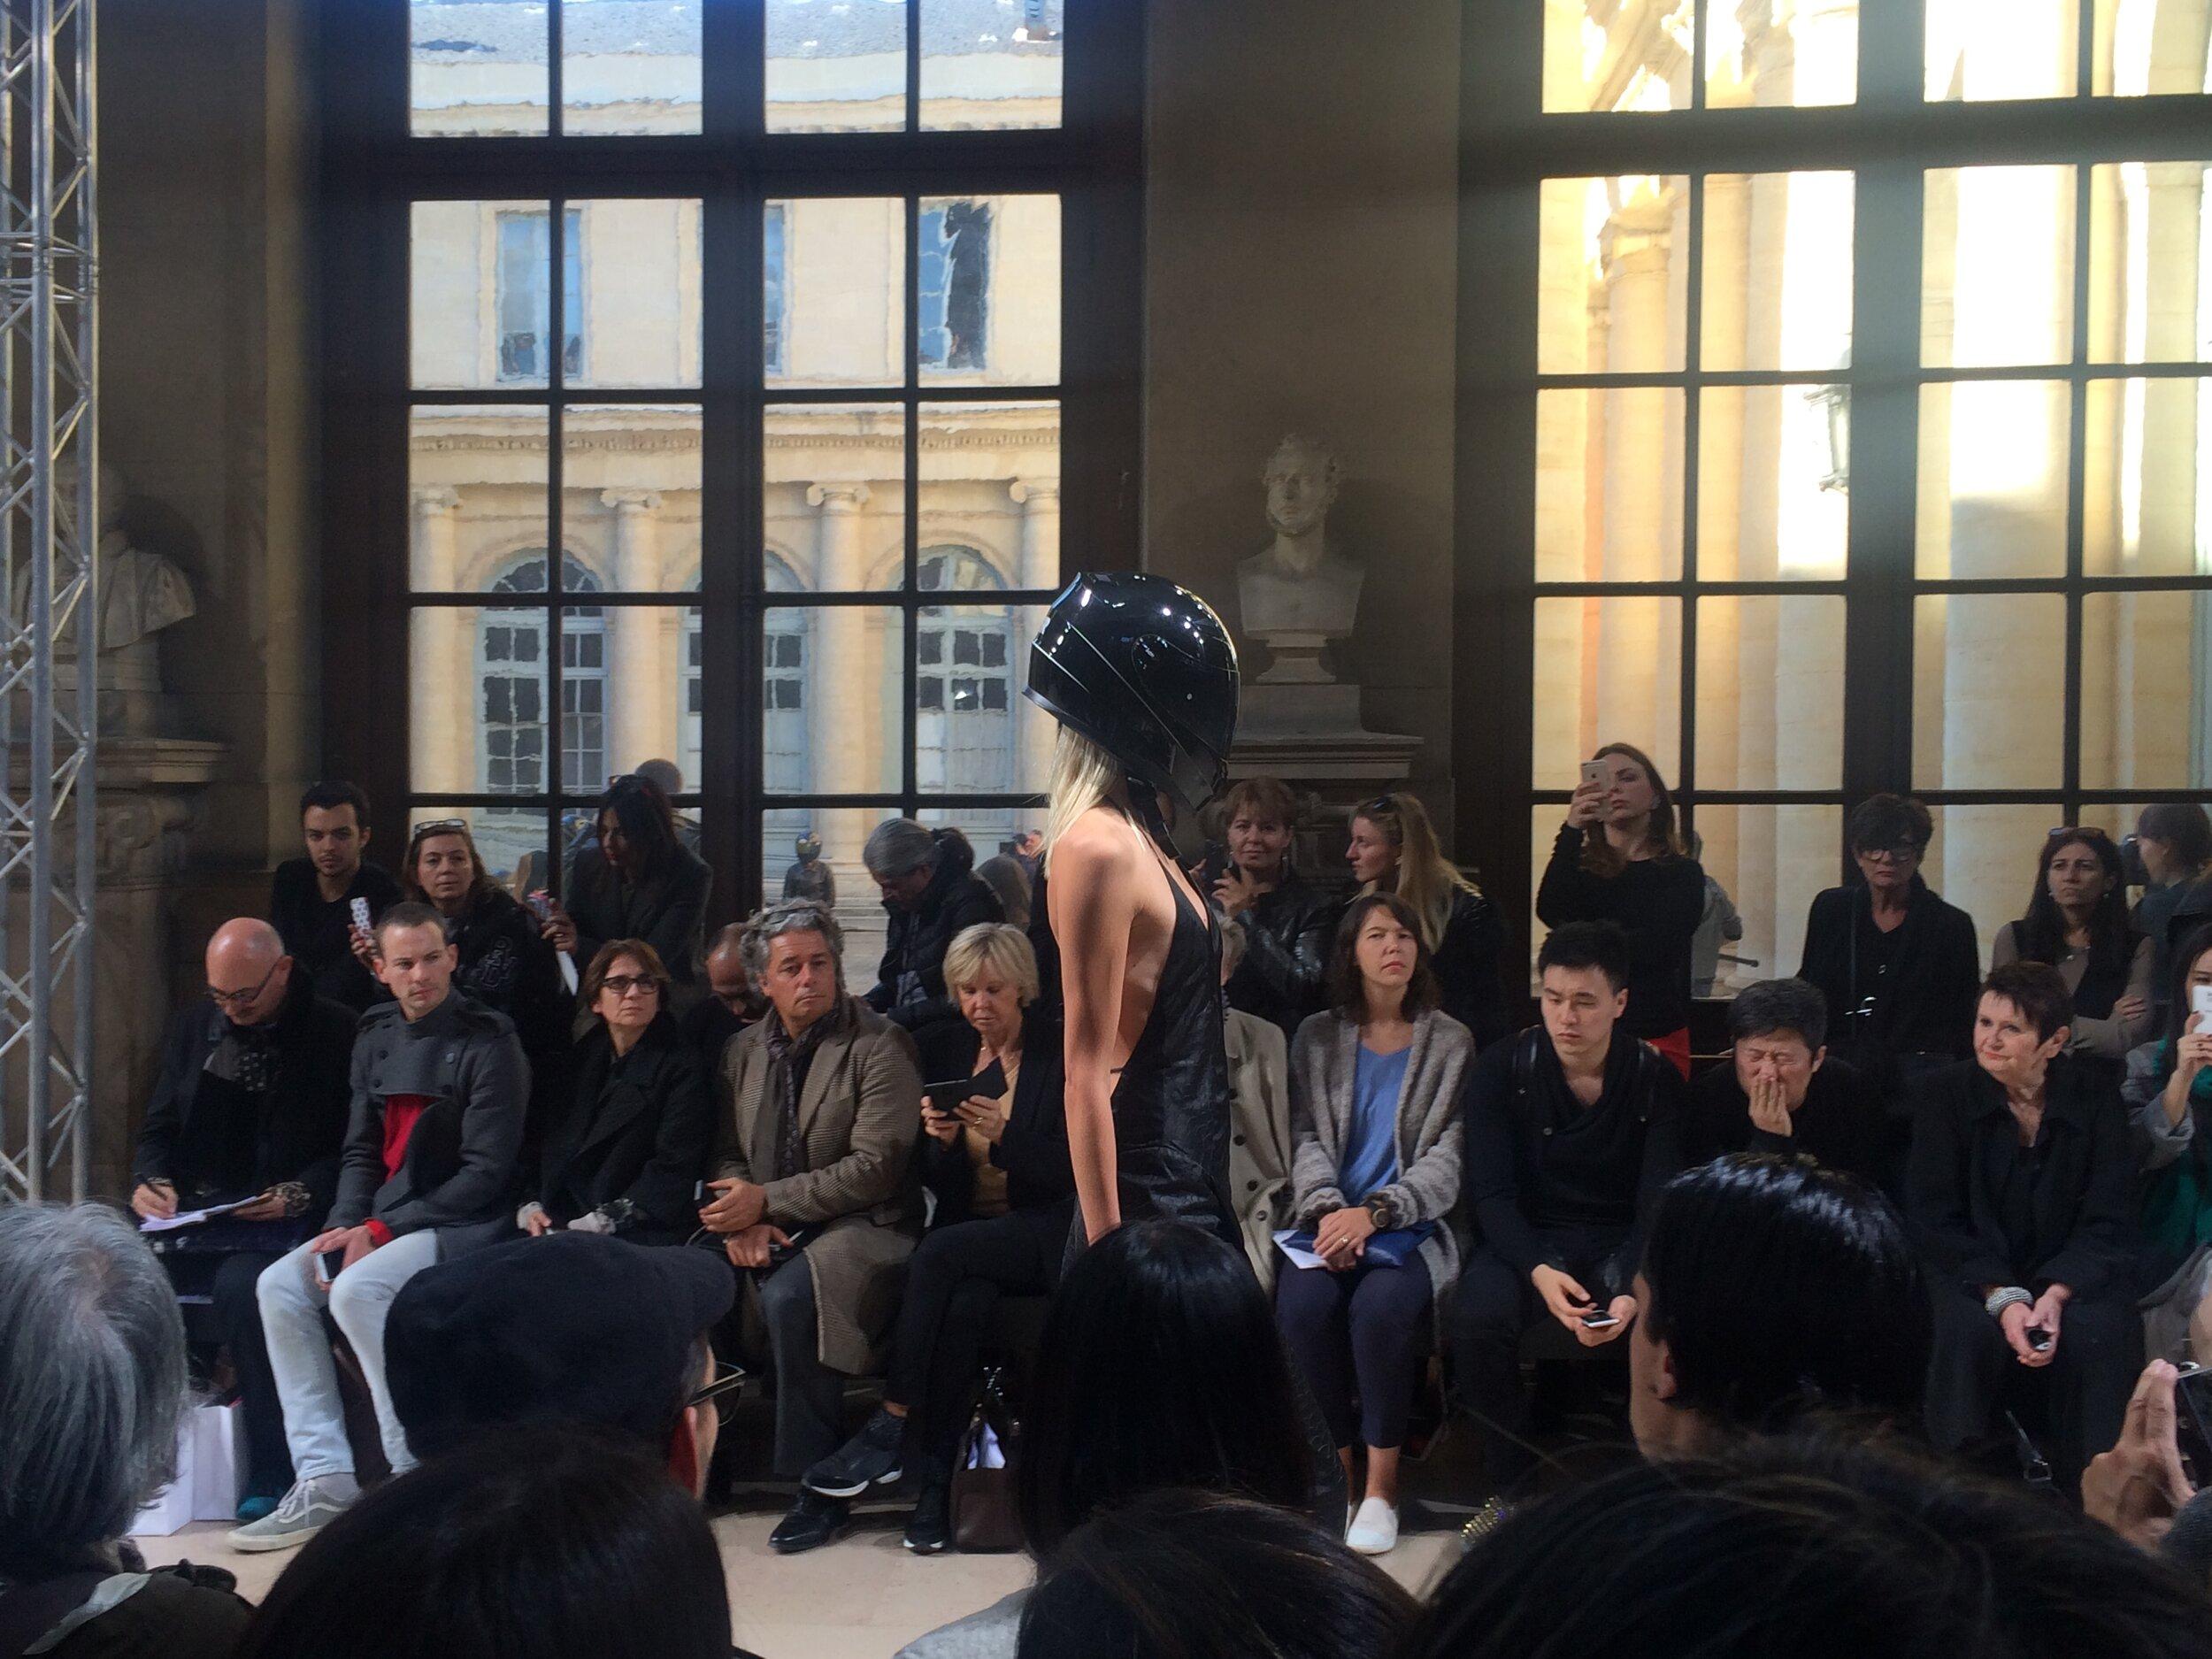 A.F. Vandevorst SS16 - a standout collection - at Paris Fashion Week.